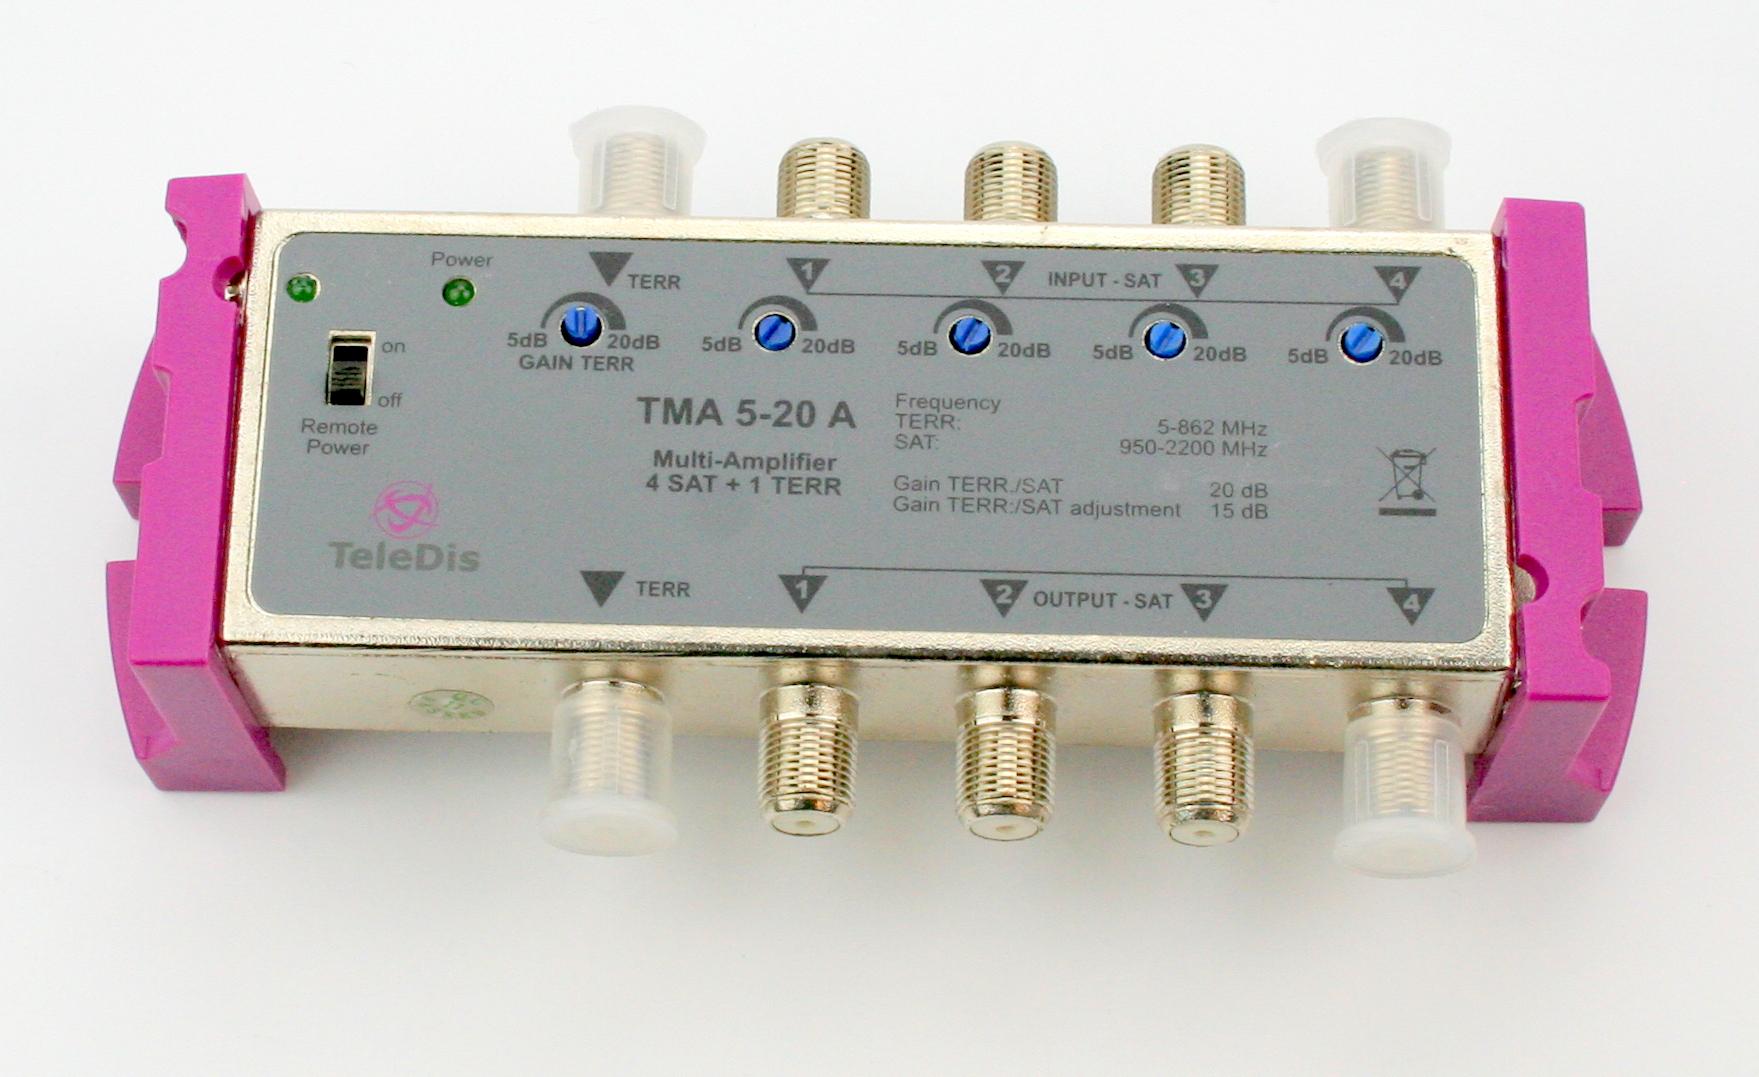 TMA 5-20 A, Multi Amplifier